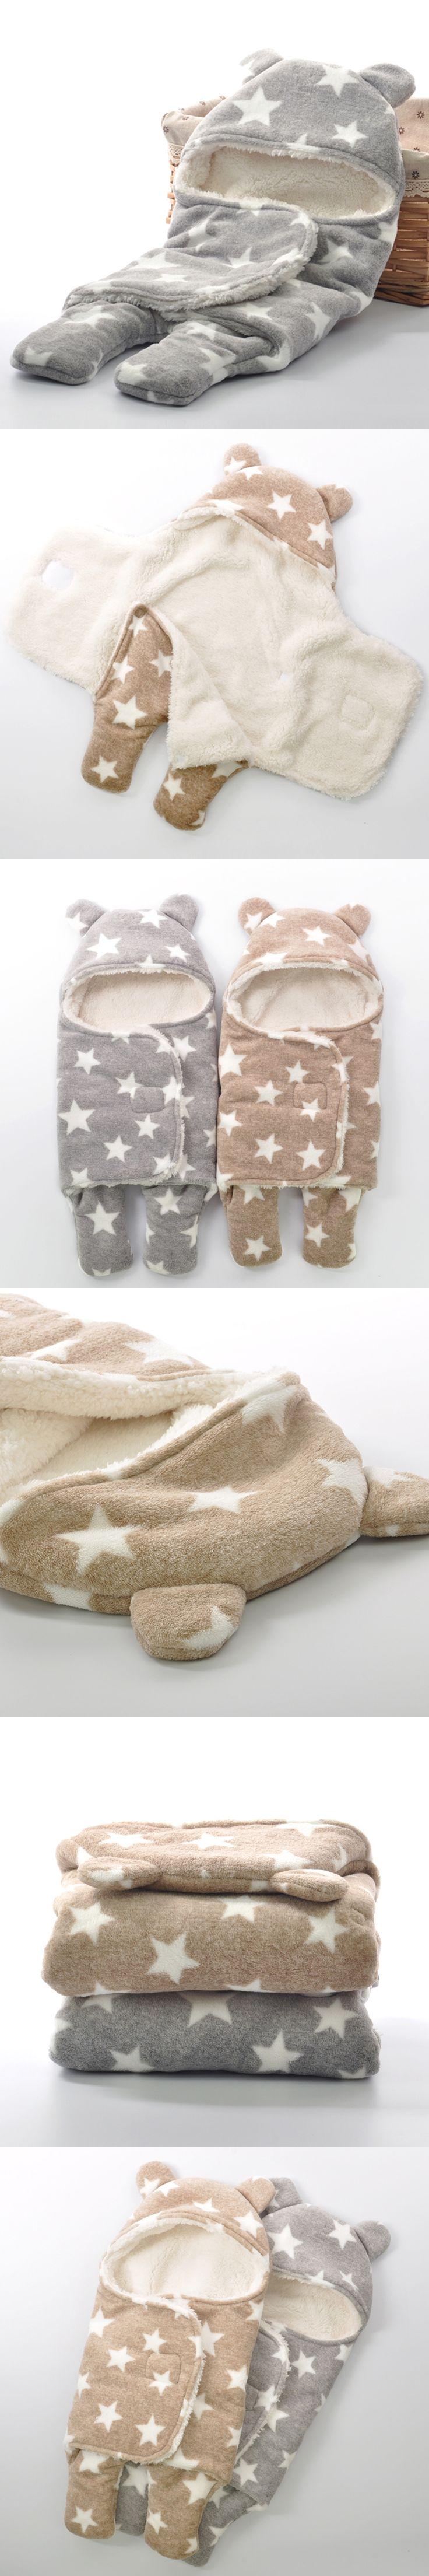 Winter Sherpa Newborn Sleepsack Swaddle 2 Ply Infant Baby Polar Fleece Swaddle Blankets Set 2 Size Baby Girl Boy Swaddle Blanket